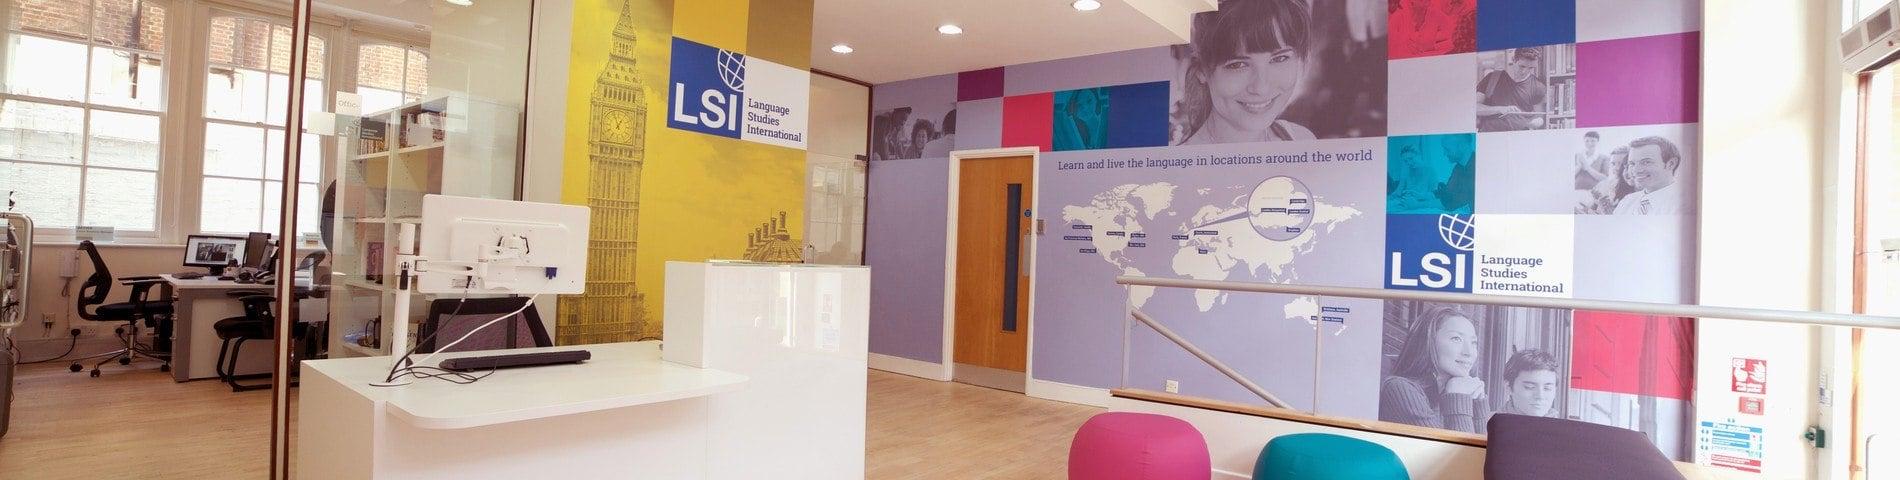 LSI - Language Studies International - Central صورة 1